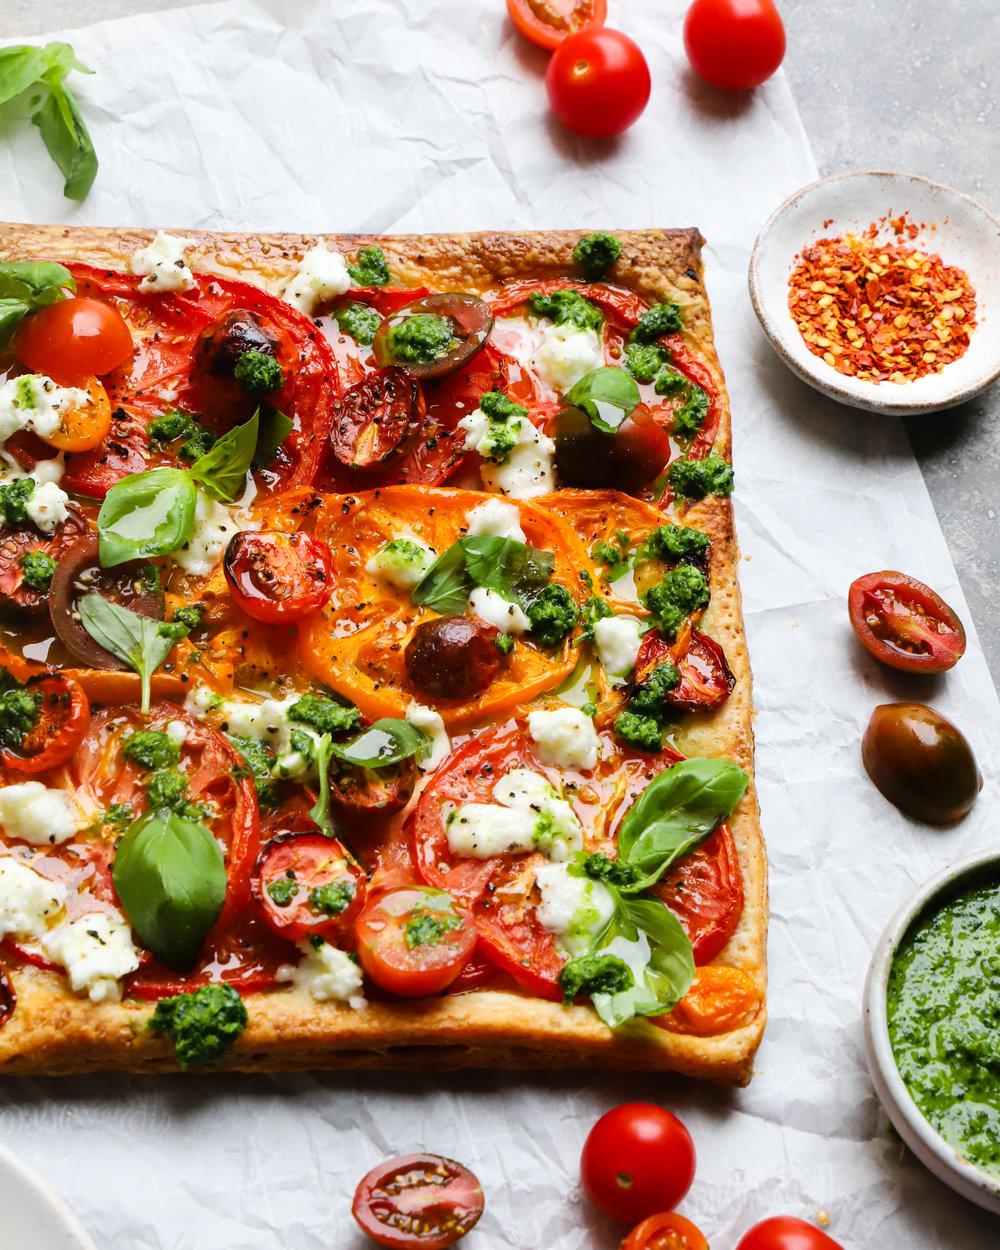 Heirloom Tomato Tart with Cilantro Chutney